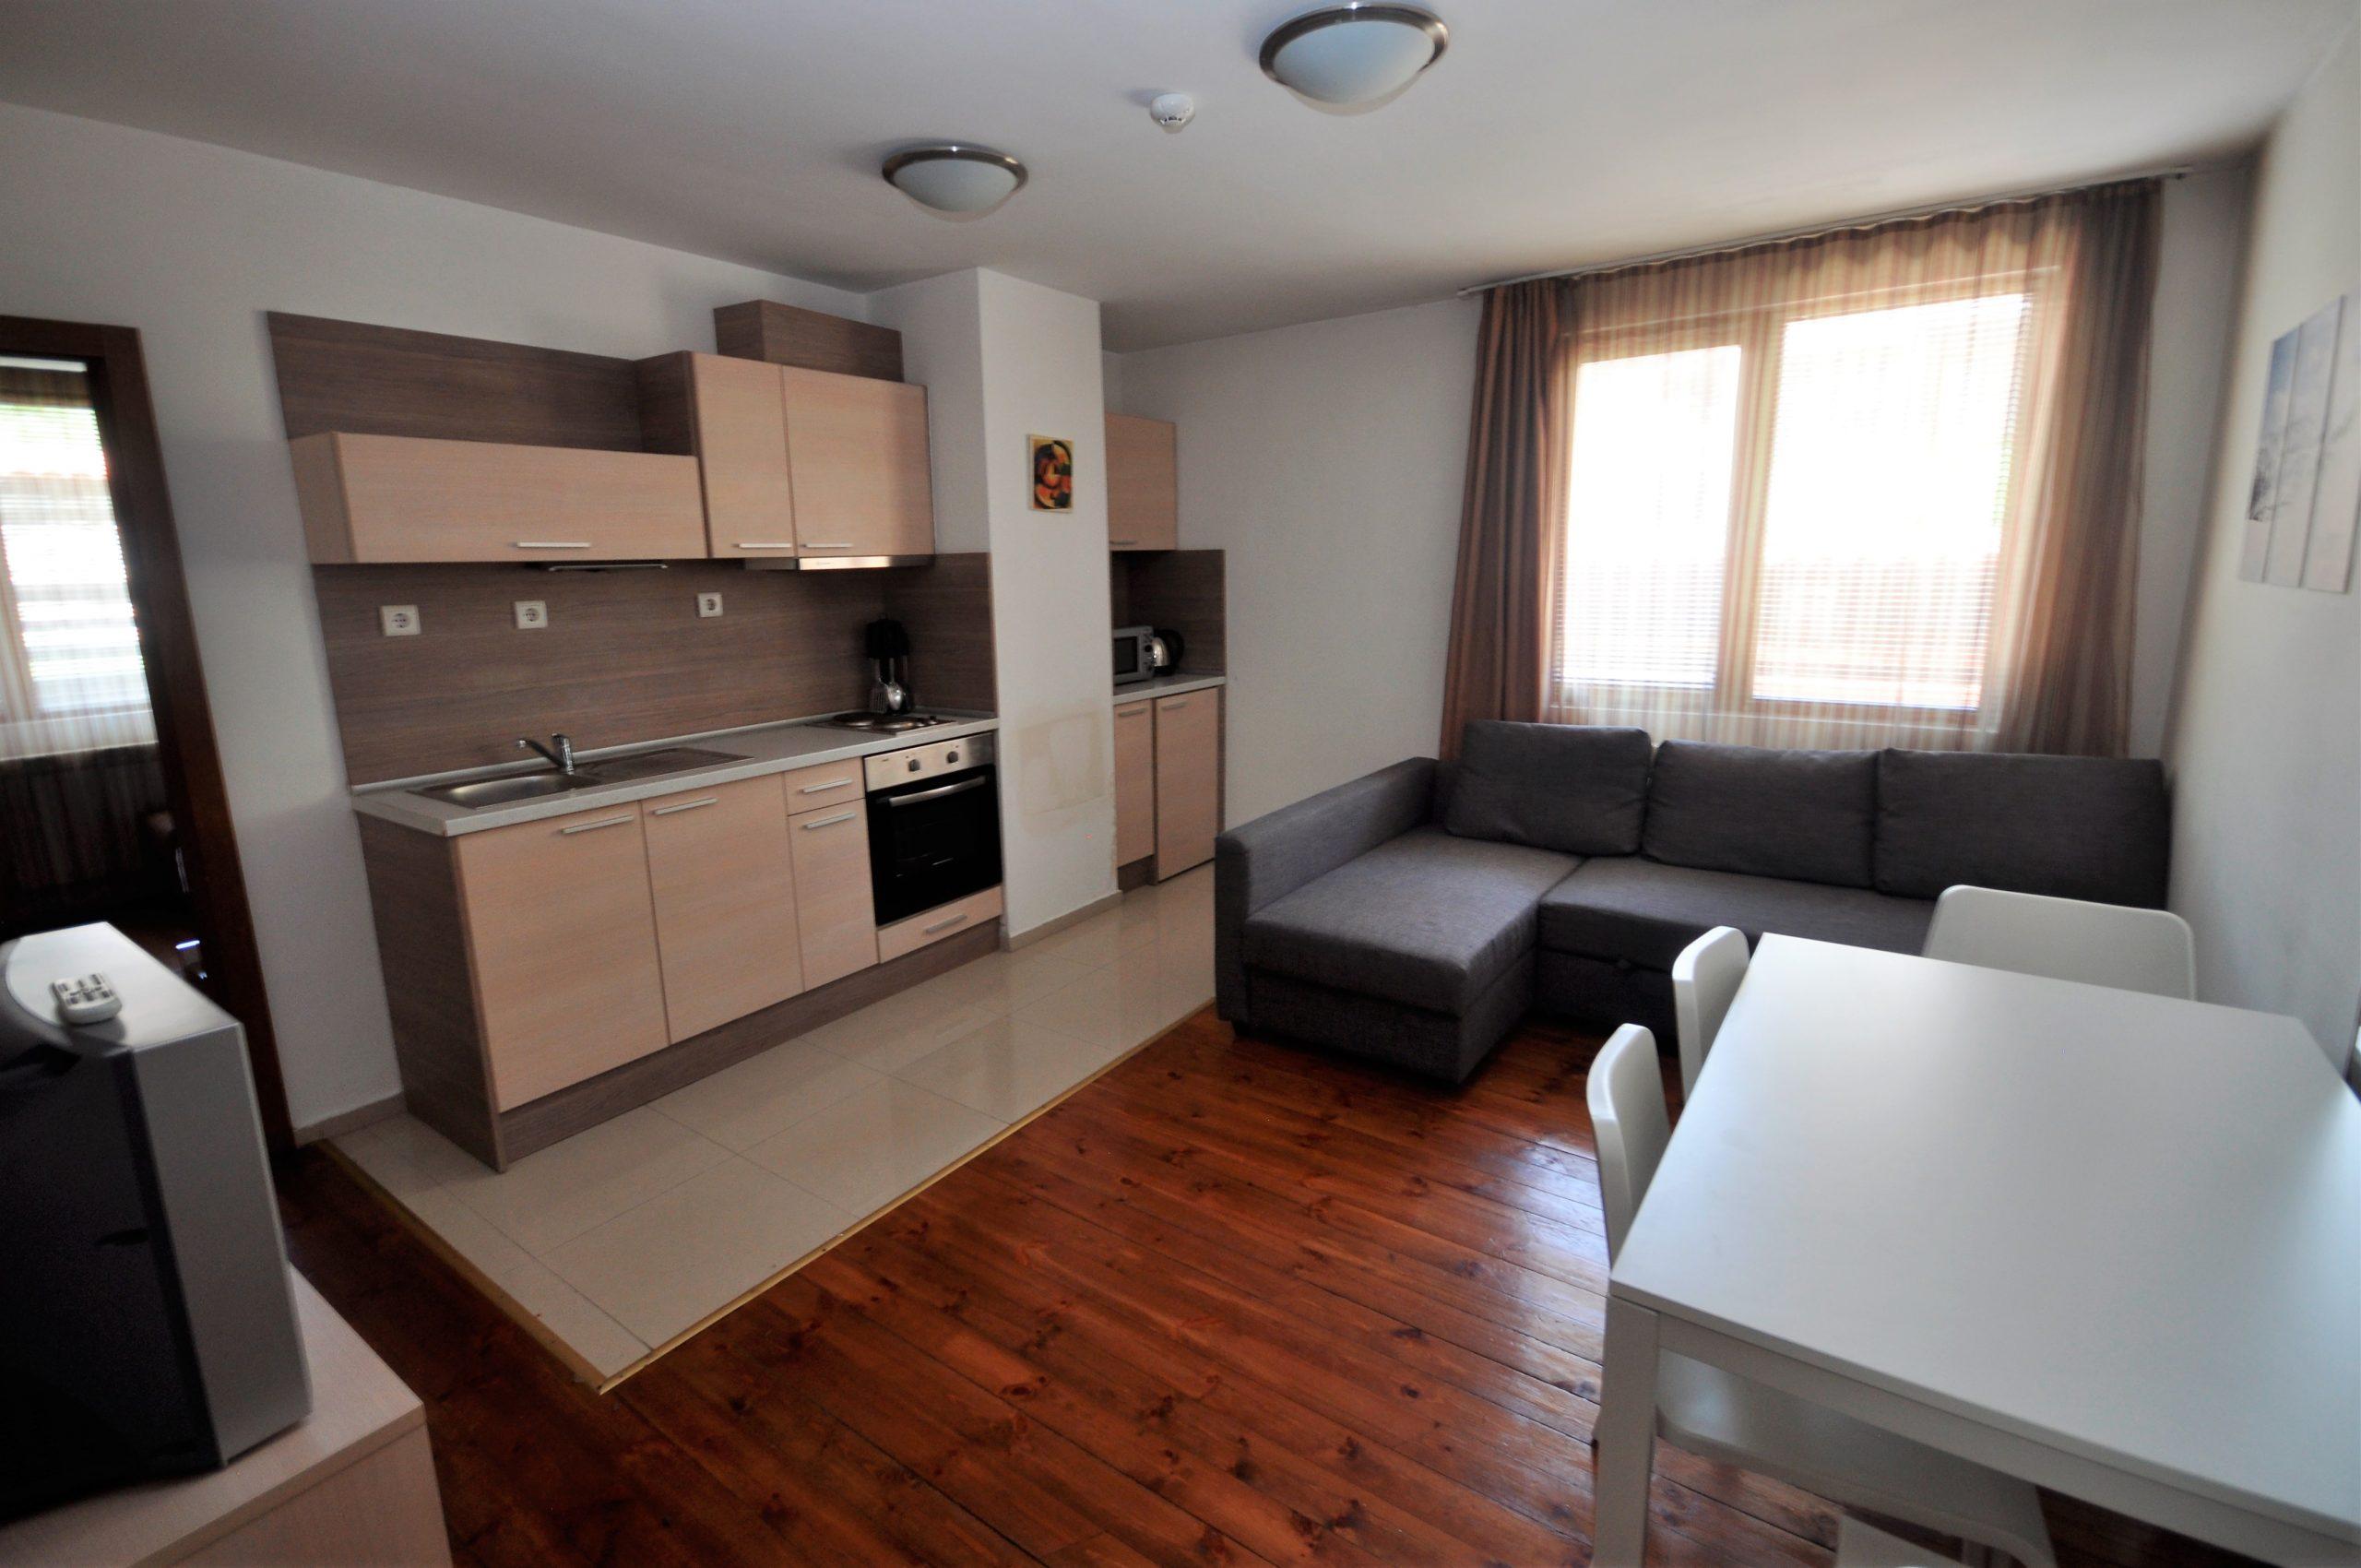 Bansko 1 Bed Apartment For Sale: Eagles Nest Complex